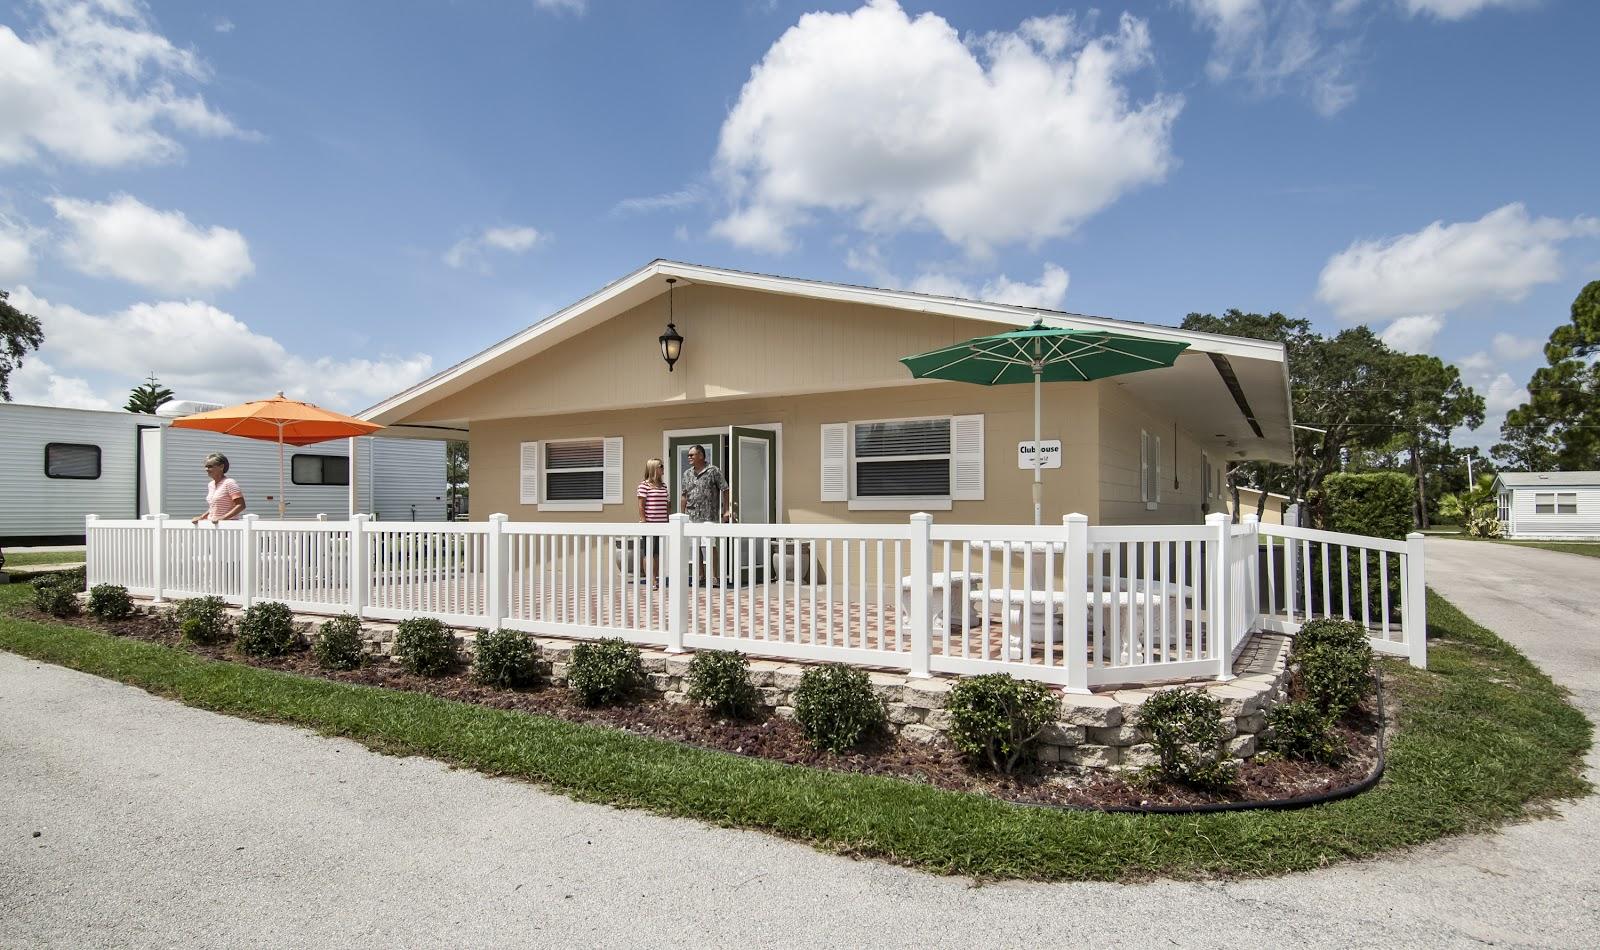 Daytona Beach Carefree Rv Resort Port Orange Florida